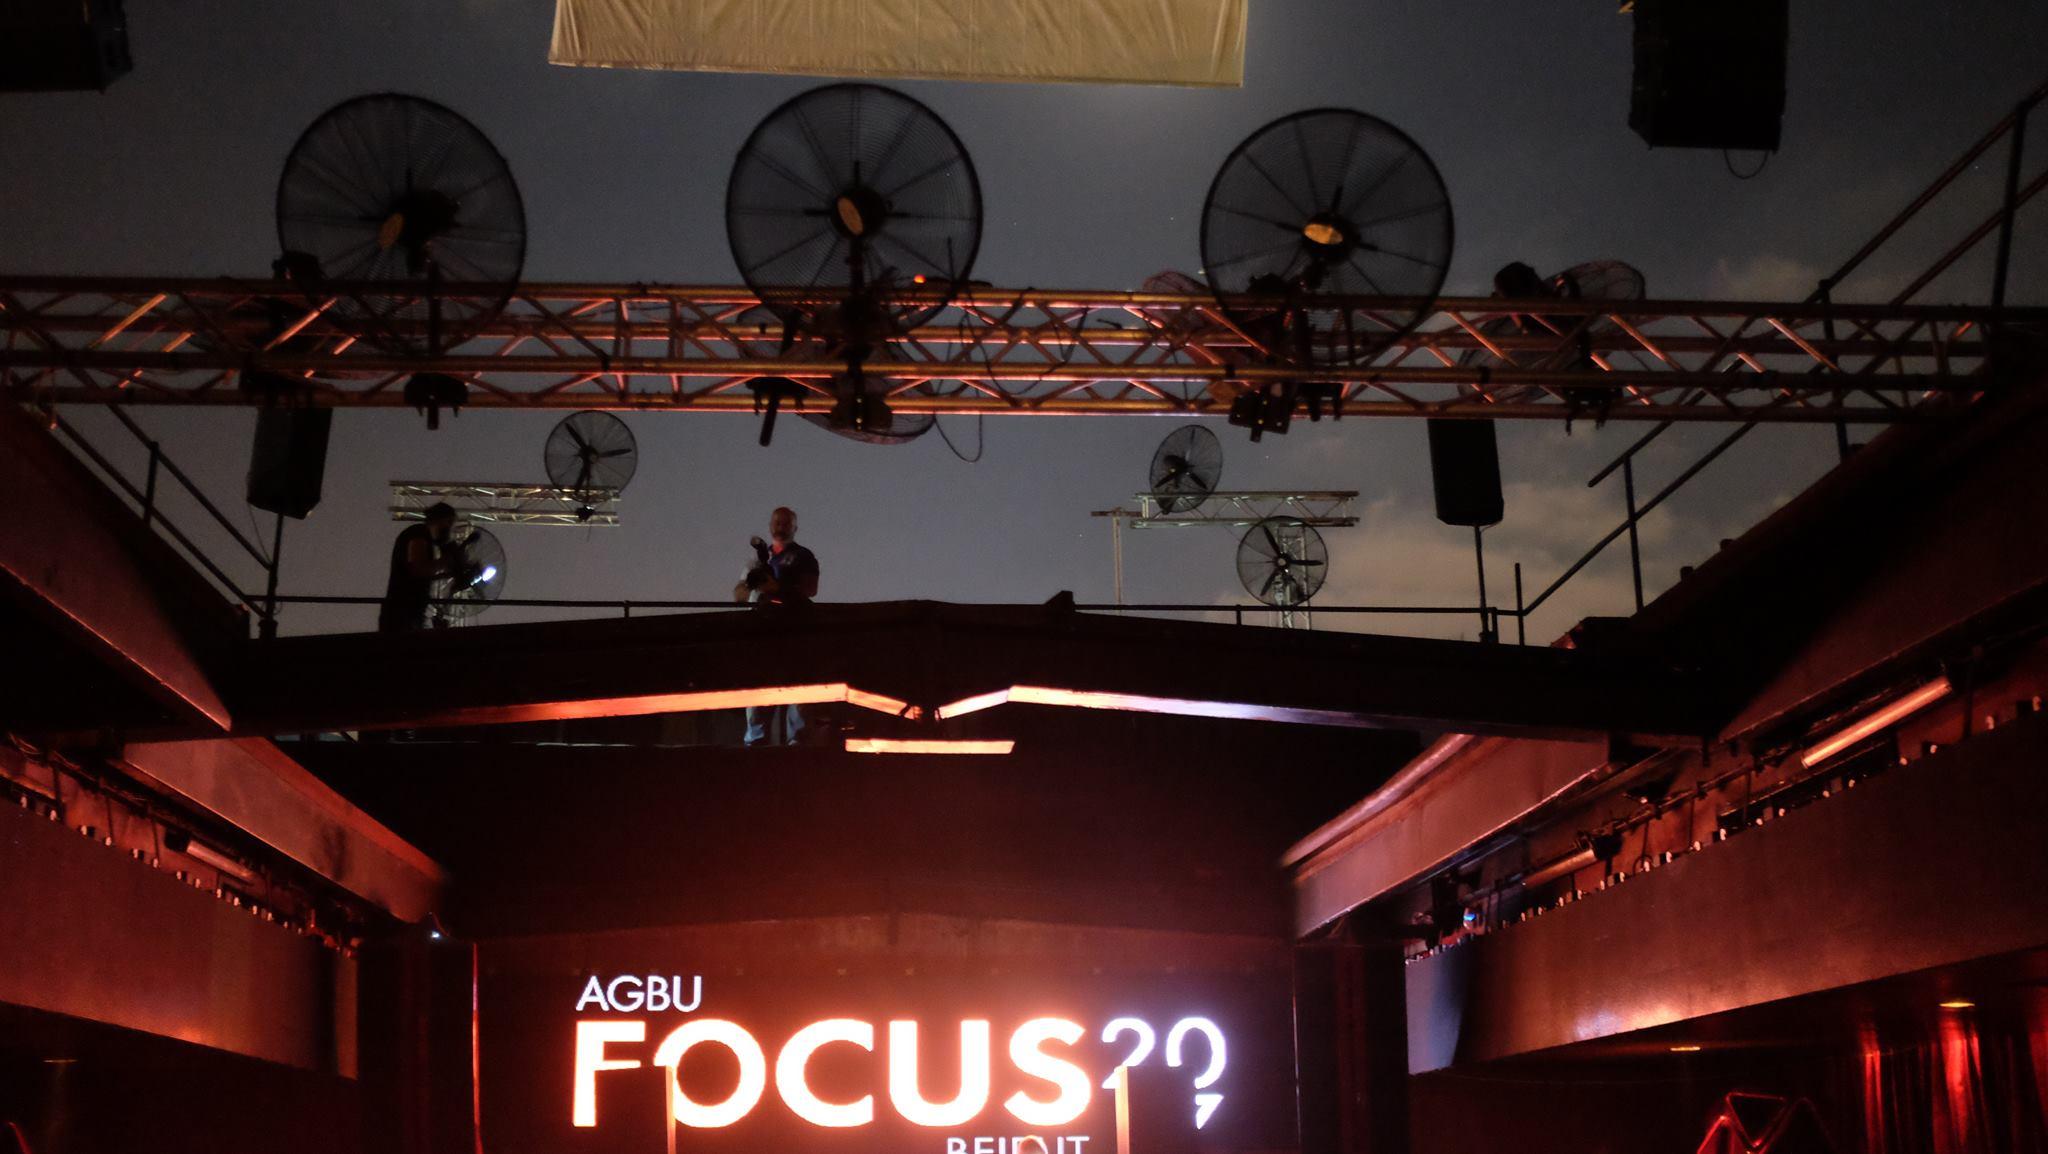 AGBU FOCUS 2017 in Beirut